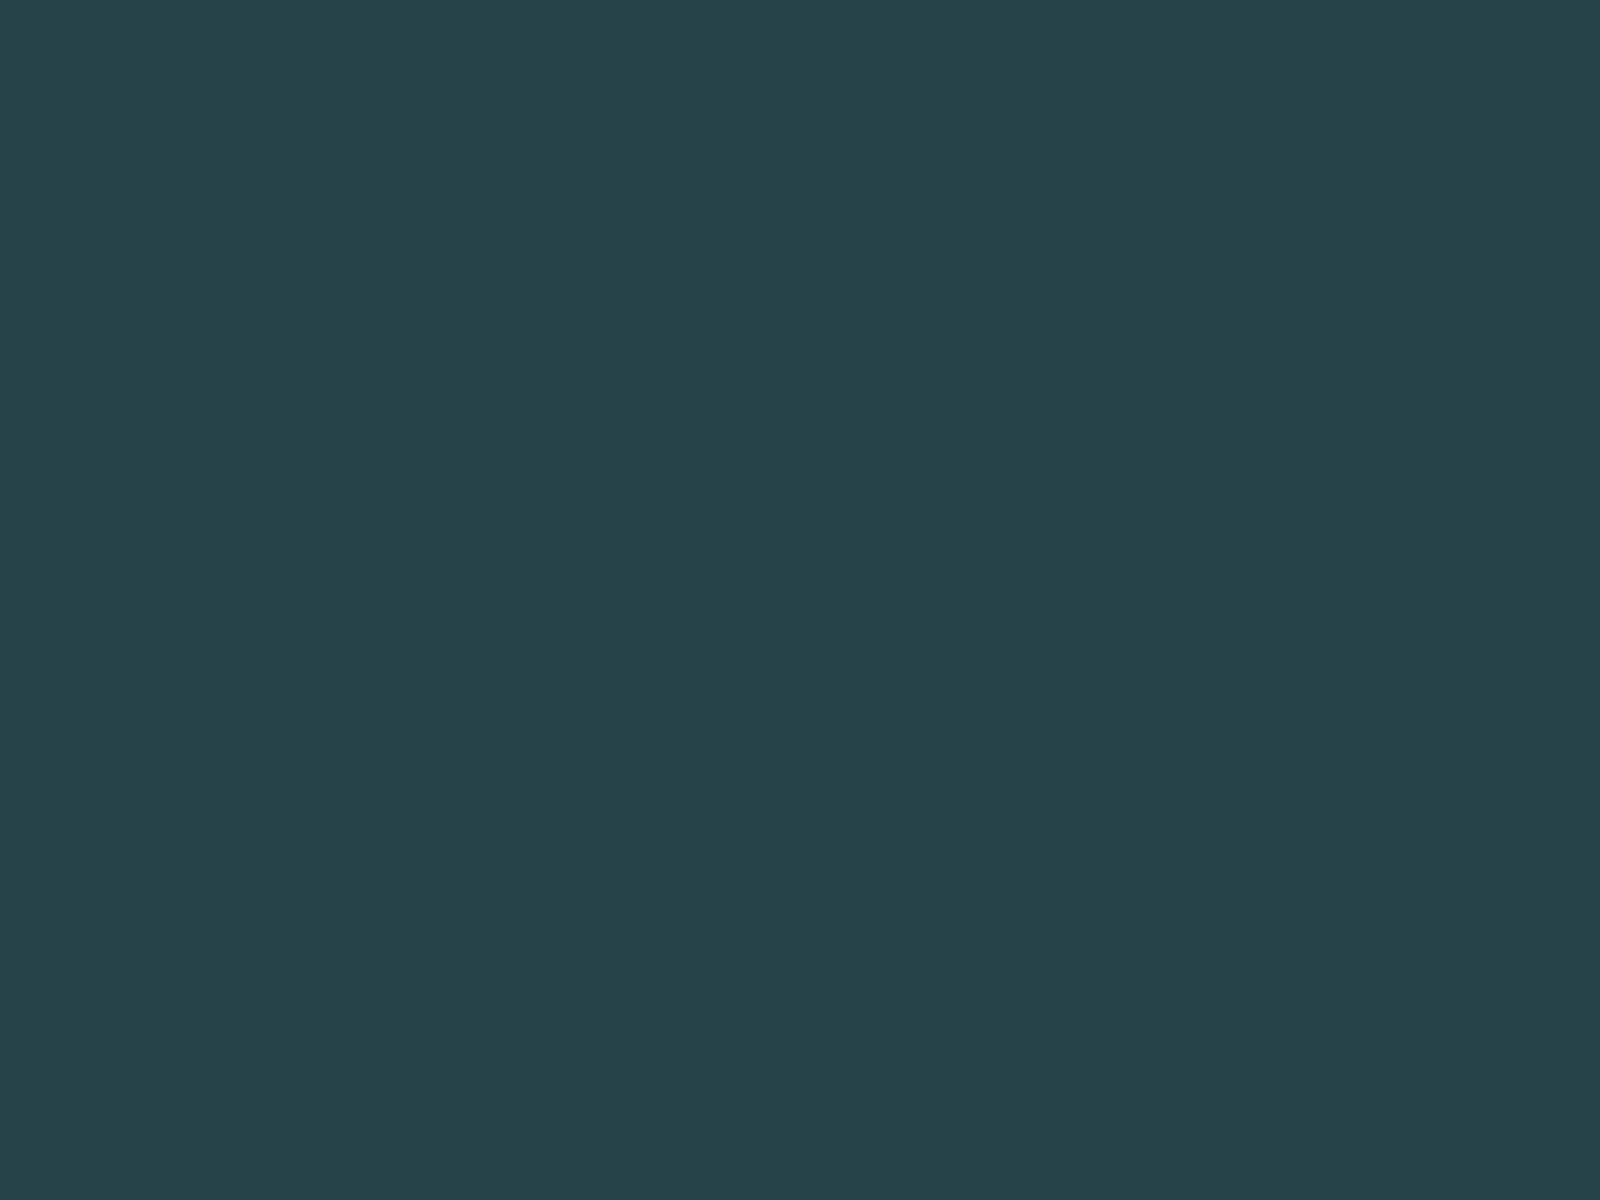 1600x1200 Japanese Indigo Solid Color Background